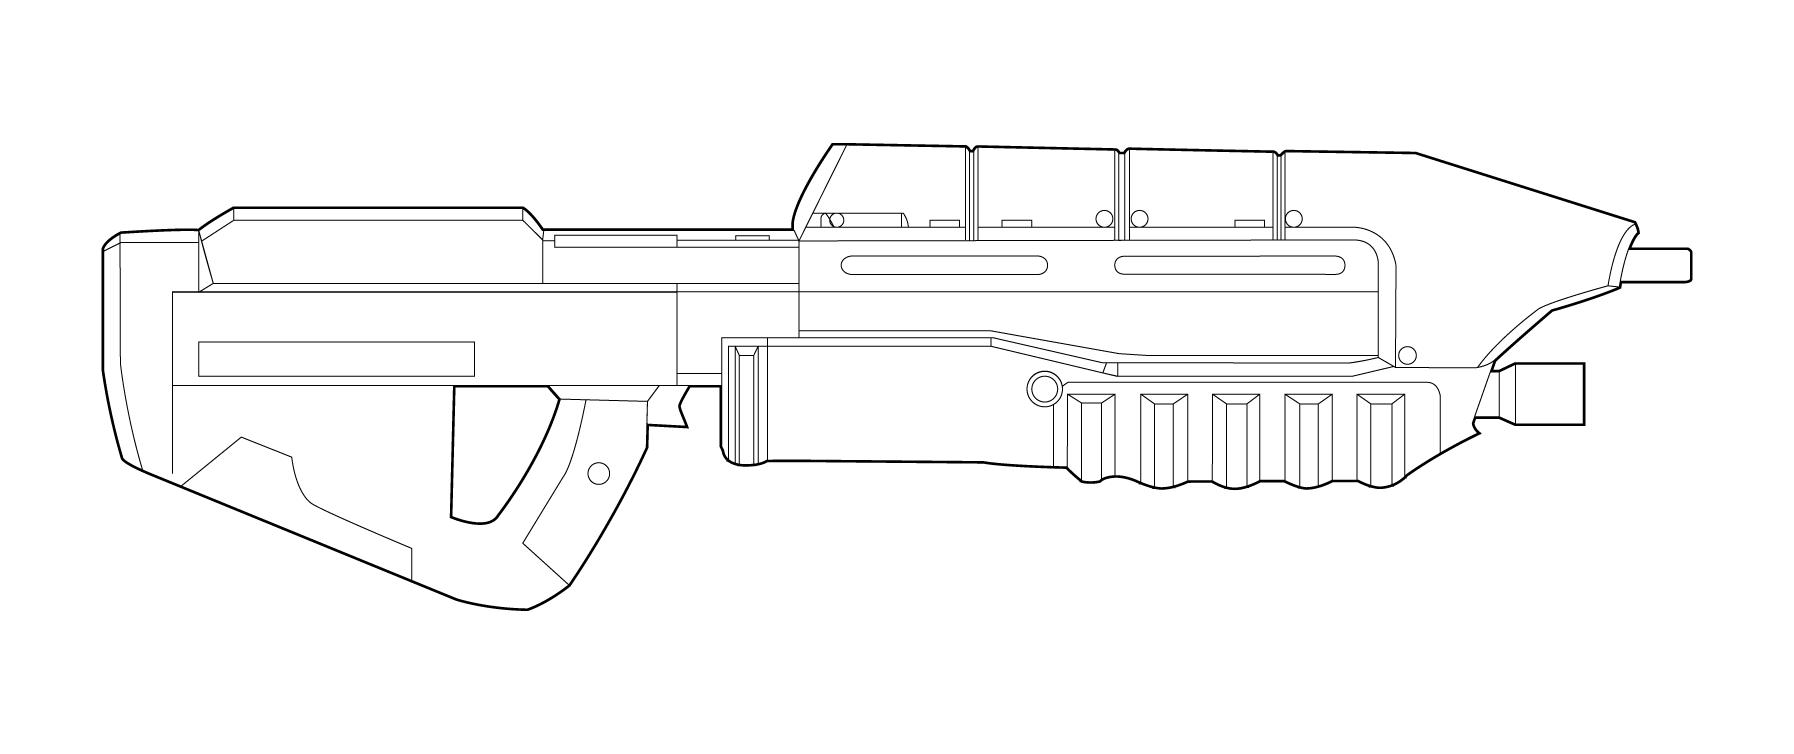 ar 15 schematic    masterchieffox.deviantart.com